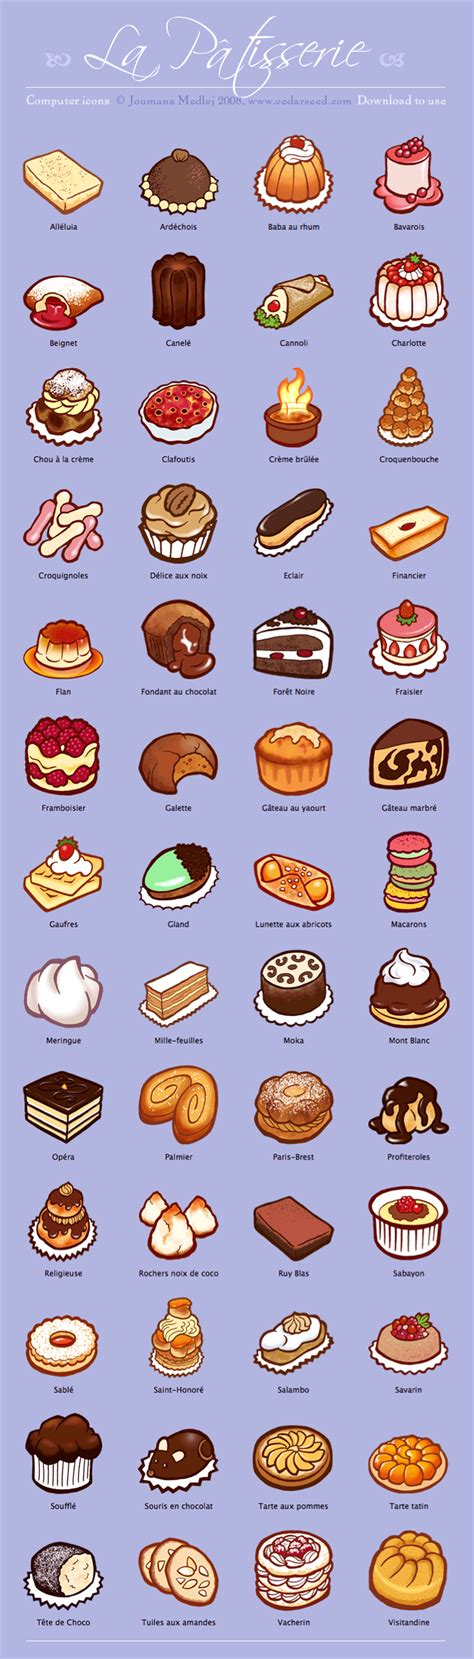 list of dessert names la patisserie icon set mac pc by majnouna on deviantart